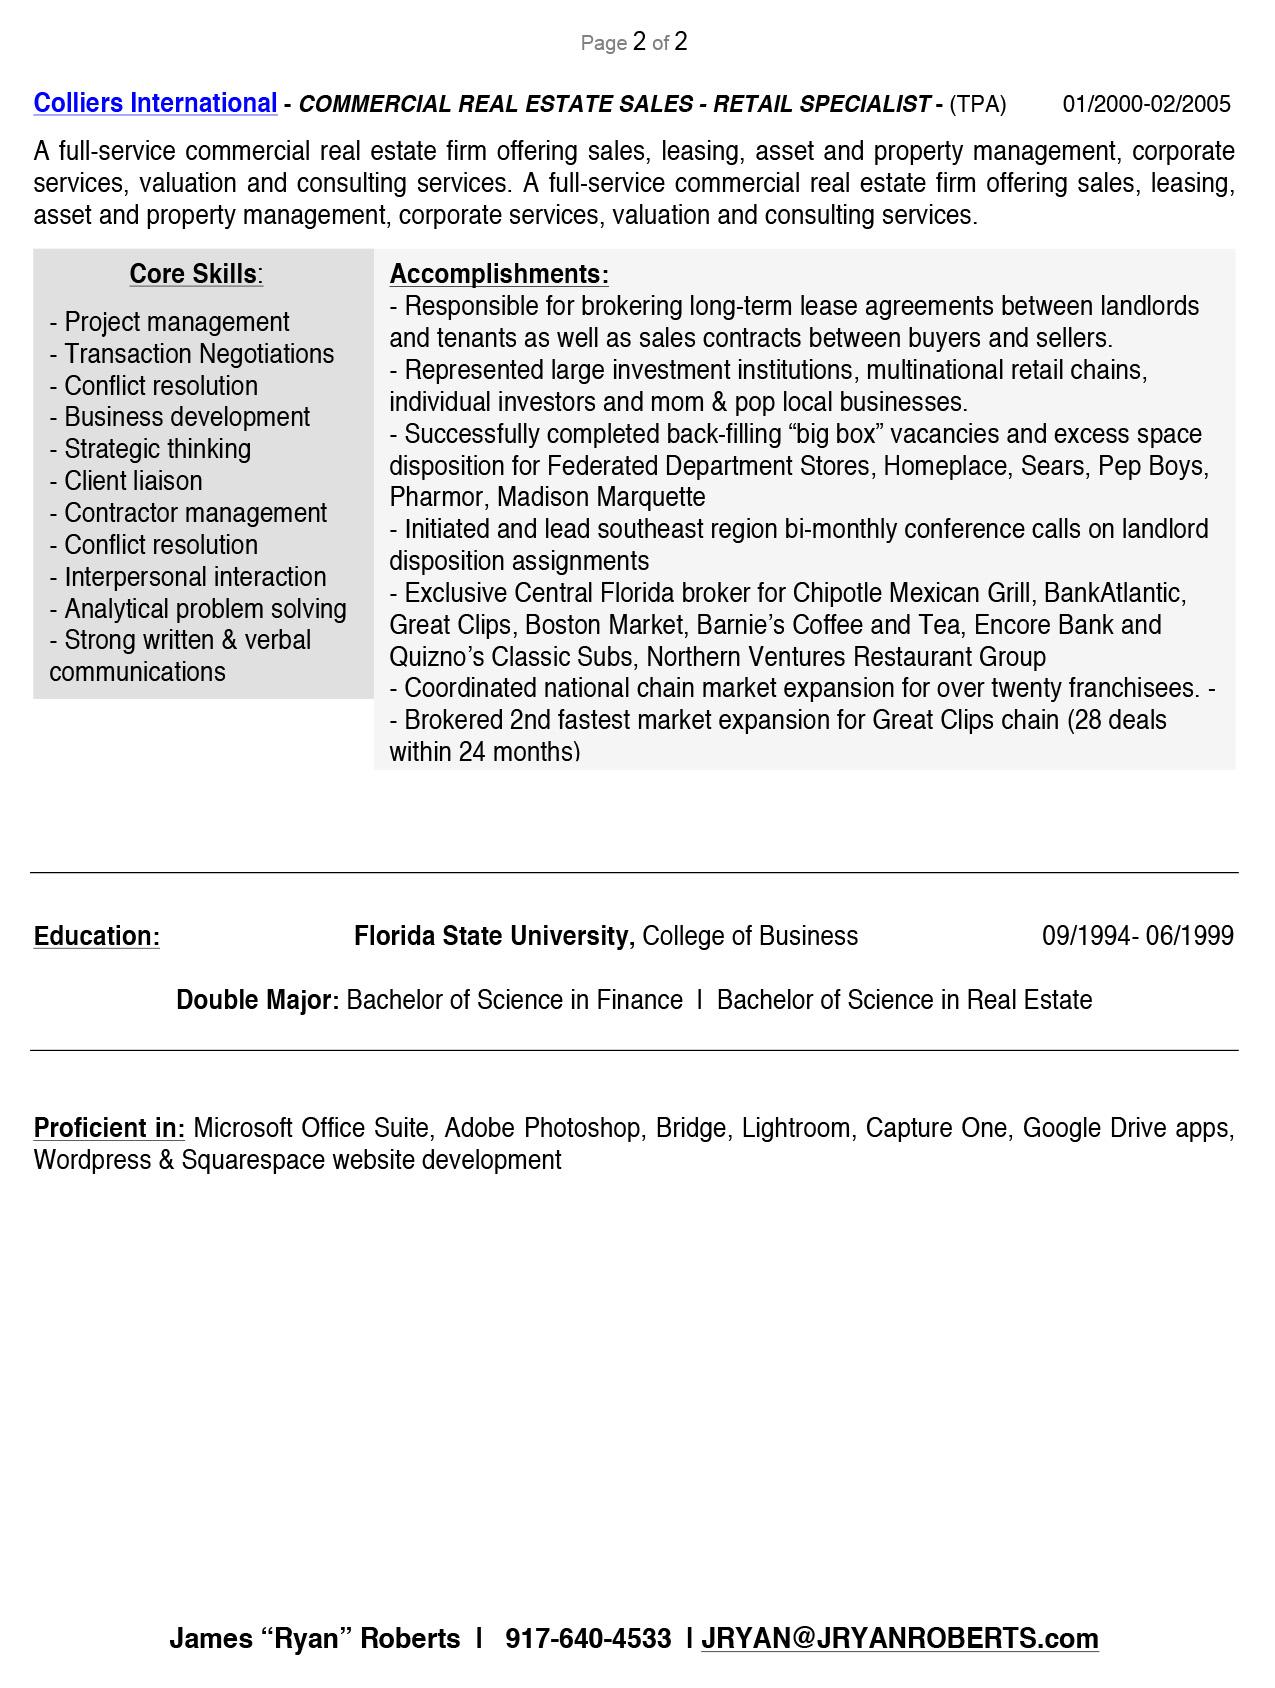 resume format for double major latest resume format for freshers